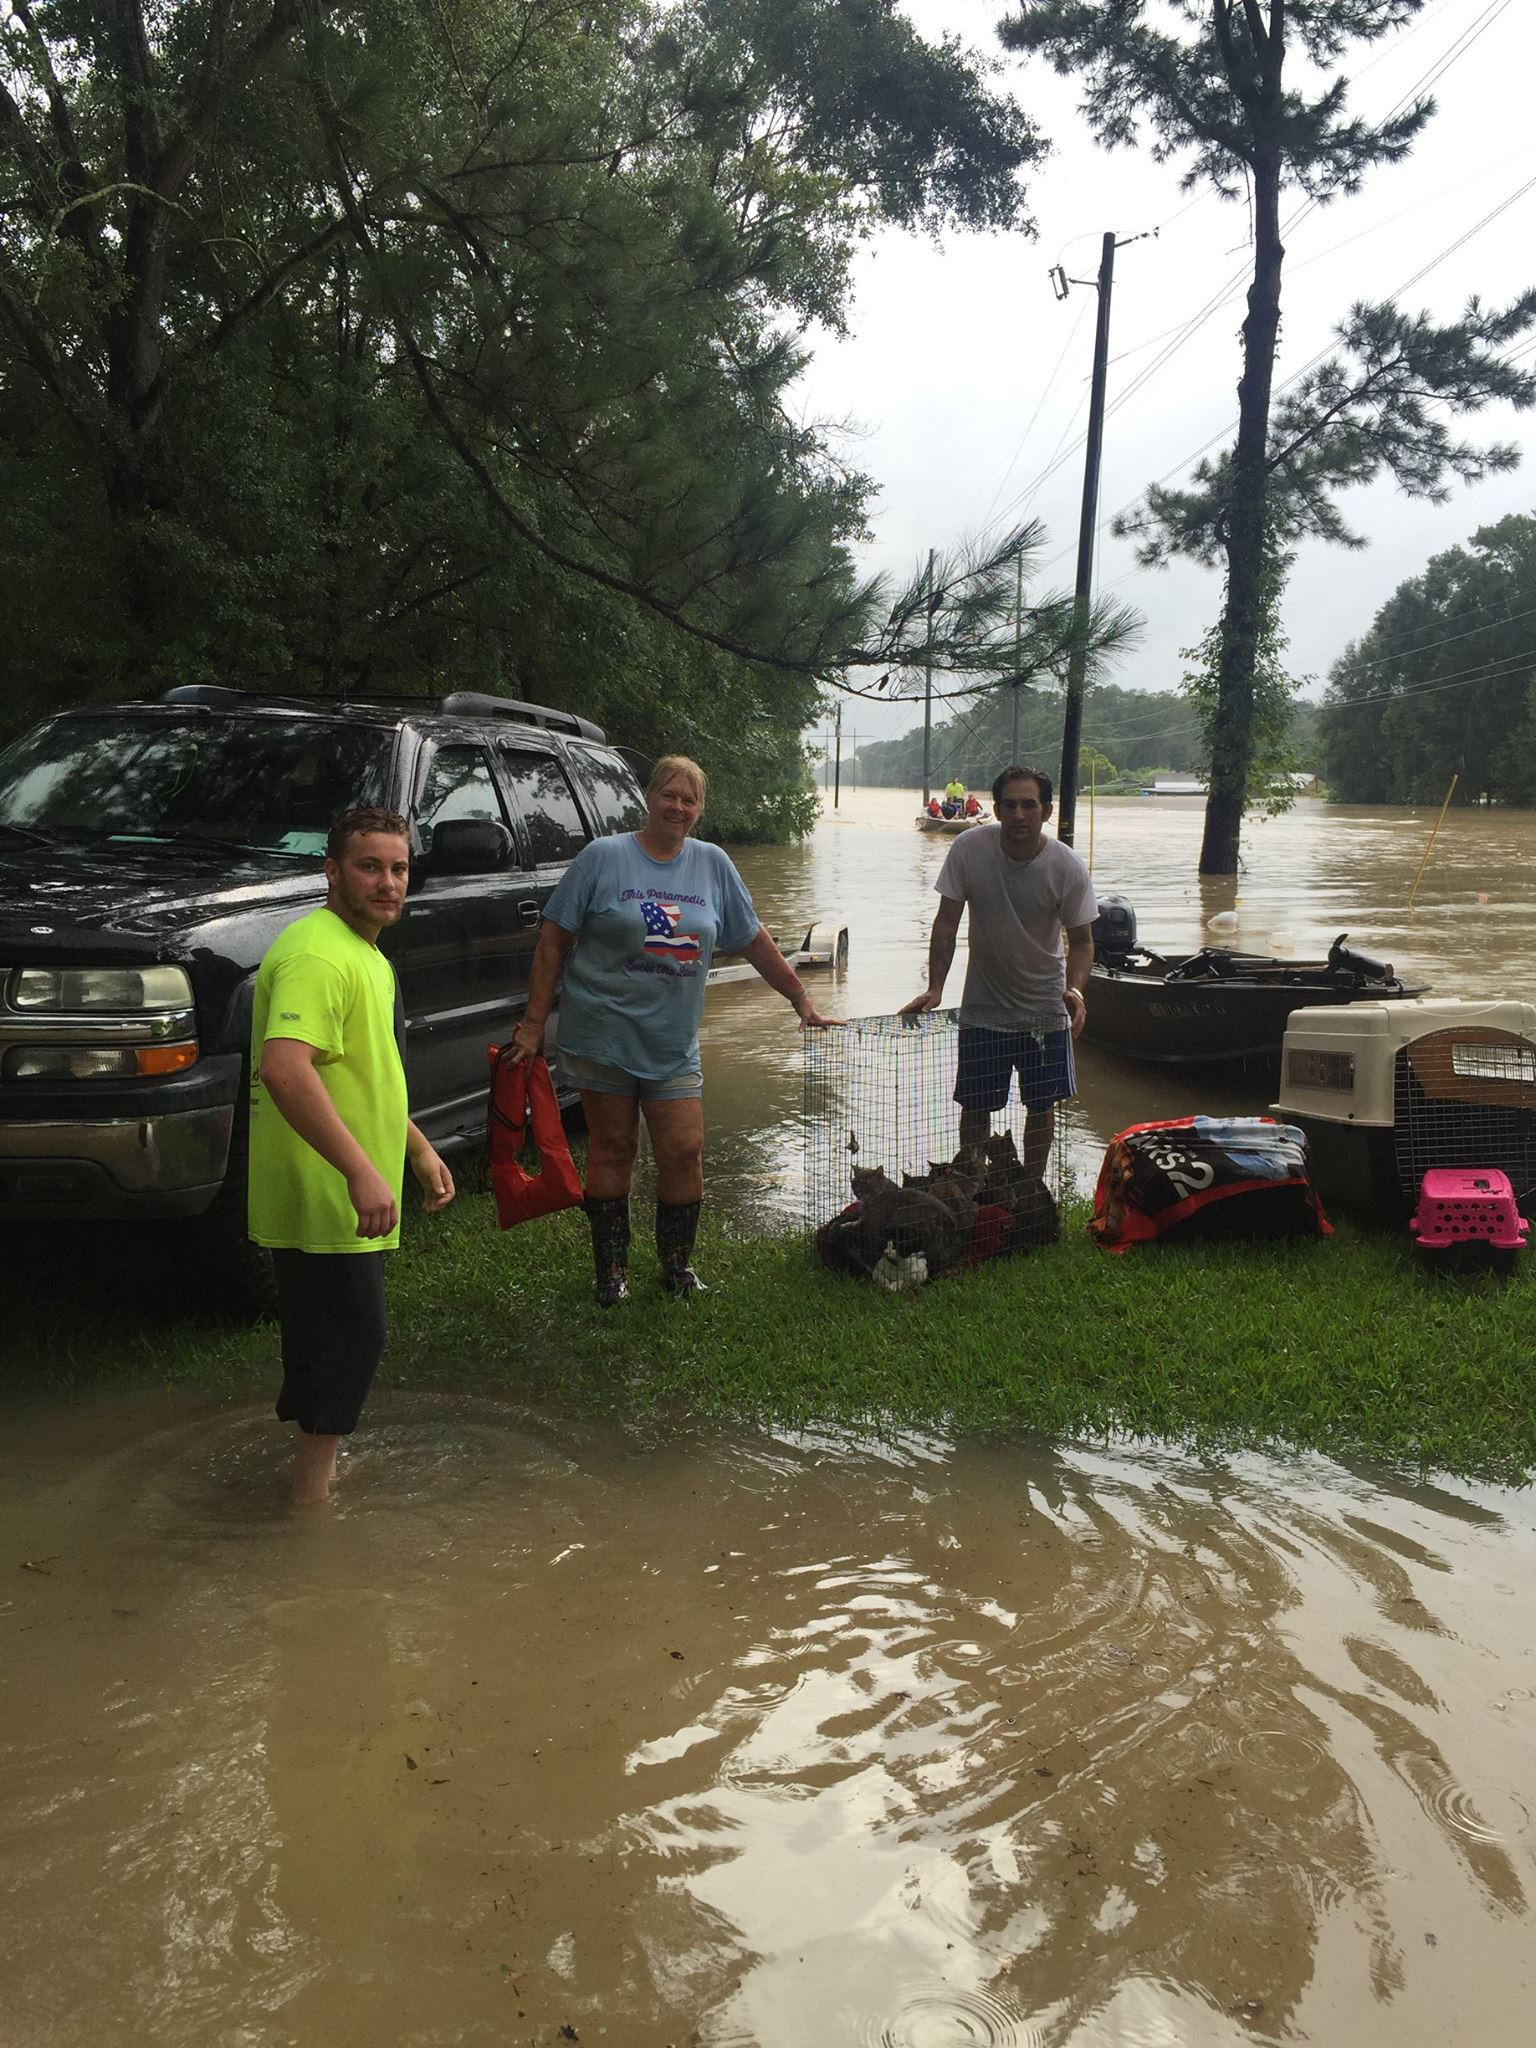 Louisiana Flood Update 13925534_1070483673035759_5064049373069238191_o